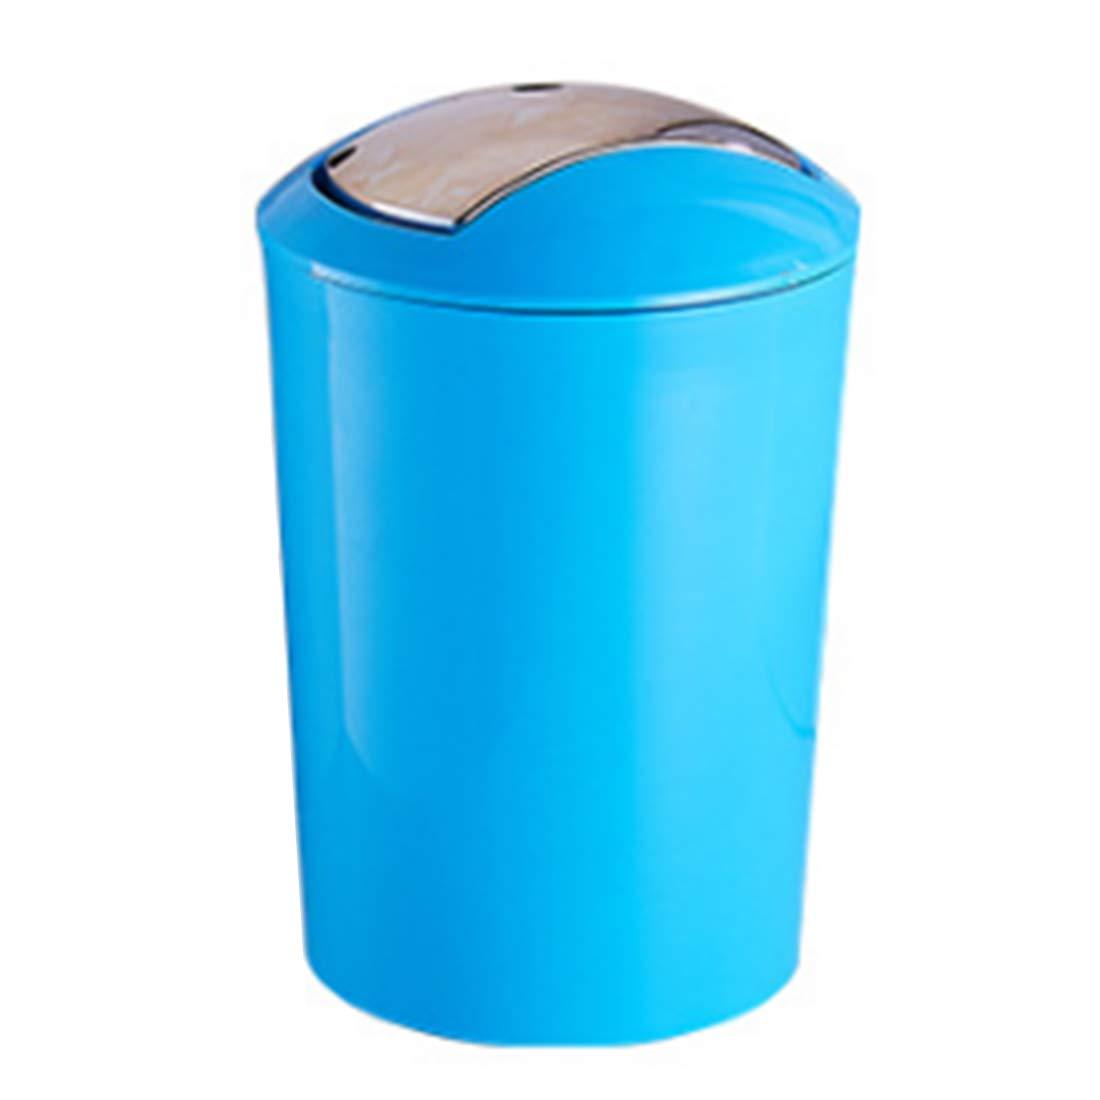 Amazon.com: Lingxuinfo 6.5L European Style Trash Can Wastebasket ...